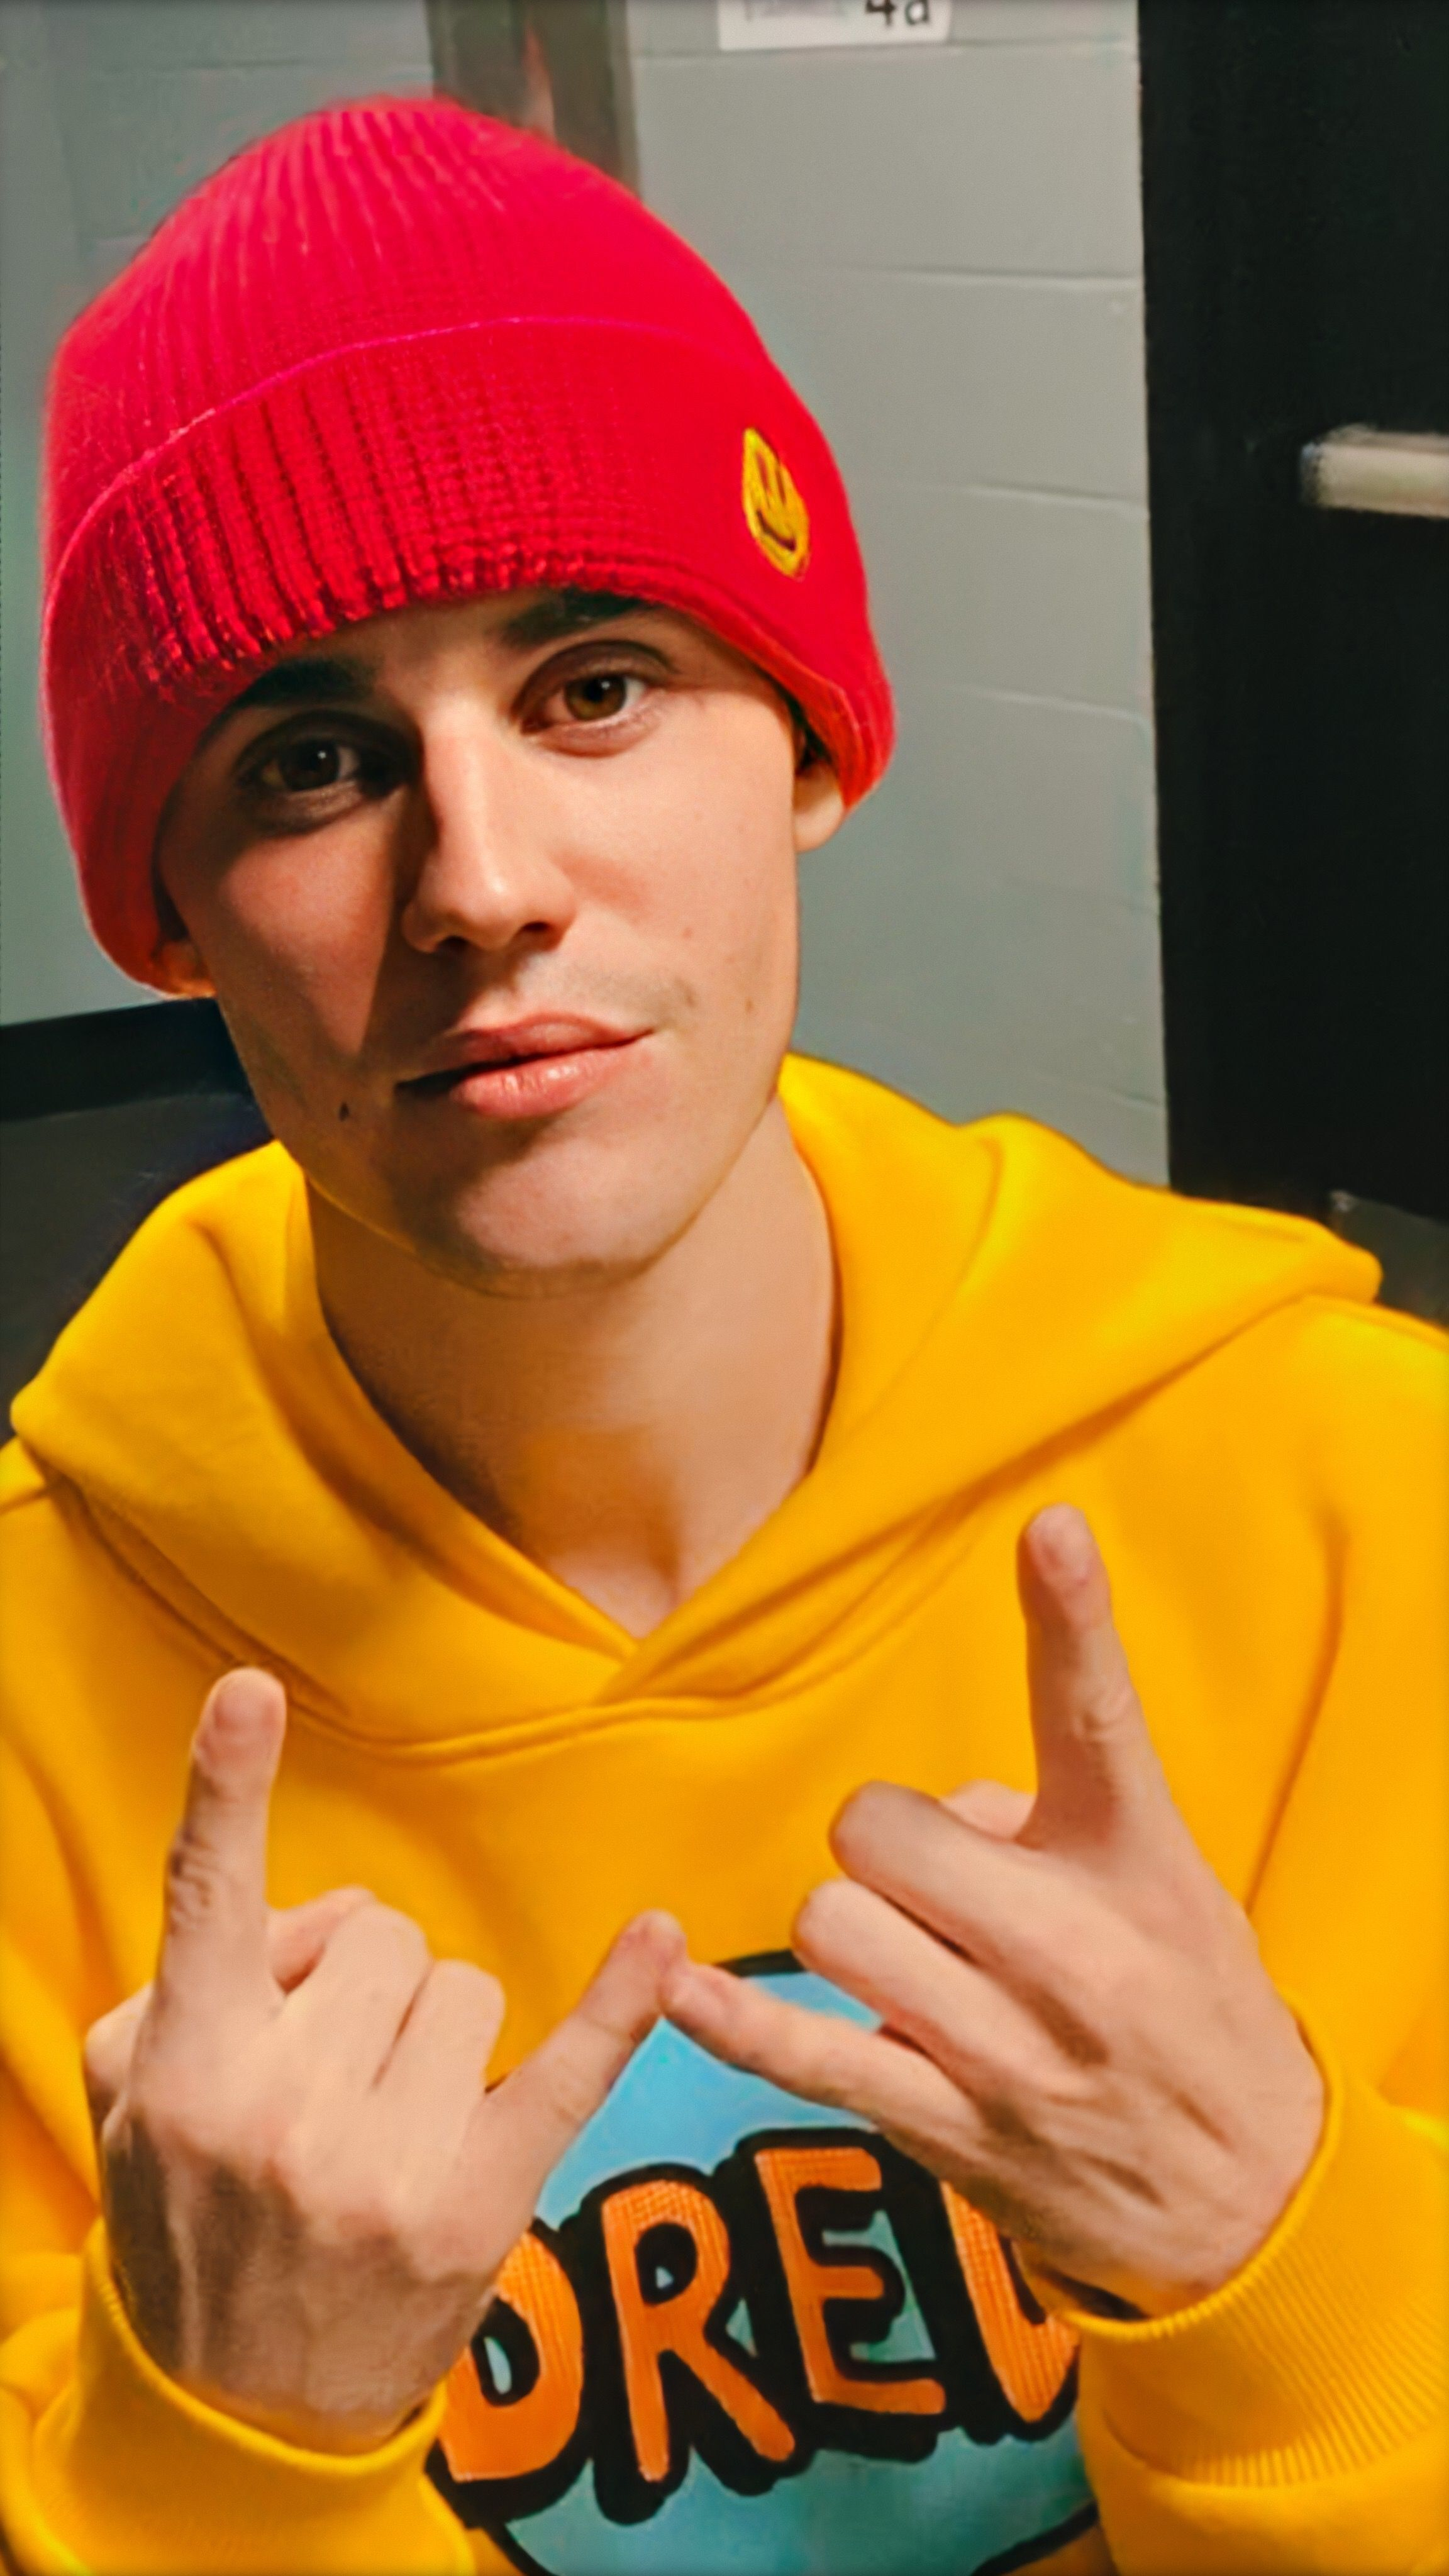 Pin By Priya Priya On Justin Bieber Wallpaper In 2020 Justin Bieber Pictures Love Justin Bieber Justin Bieber Photos